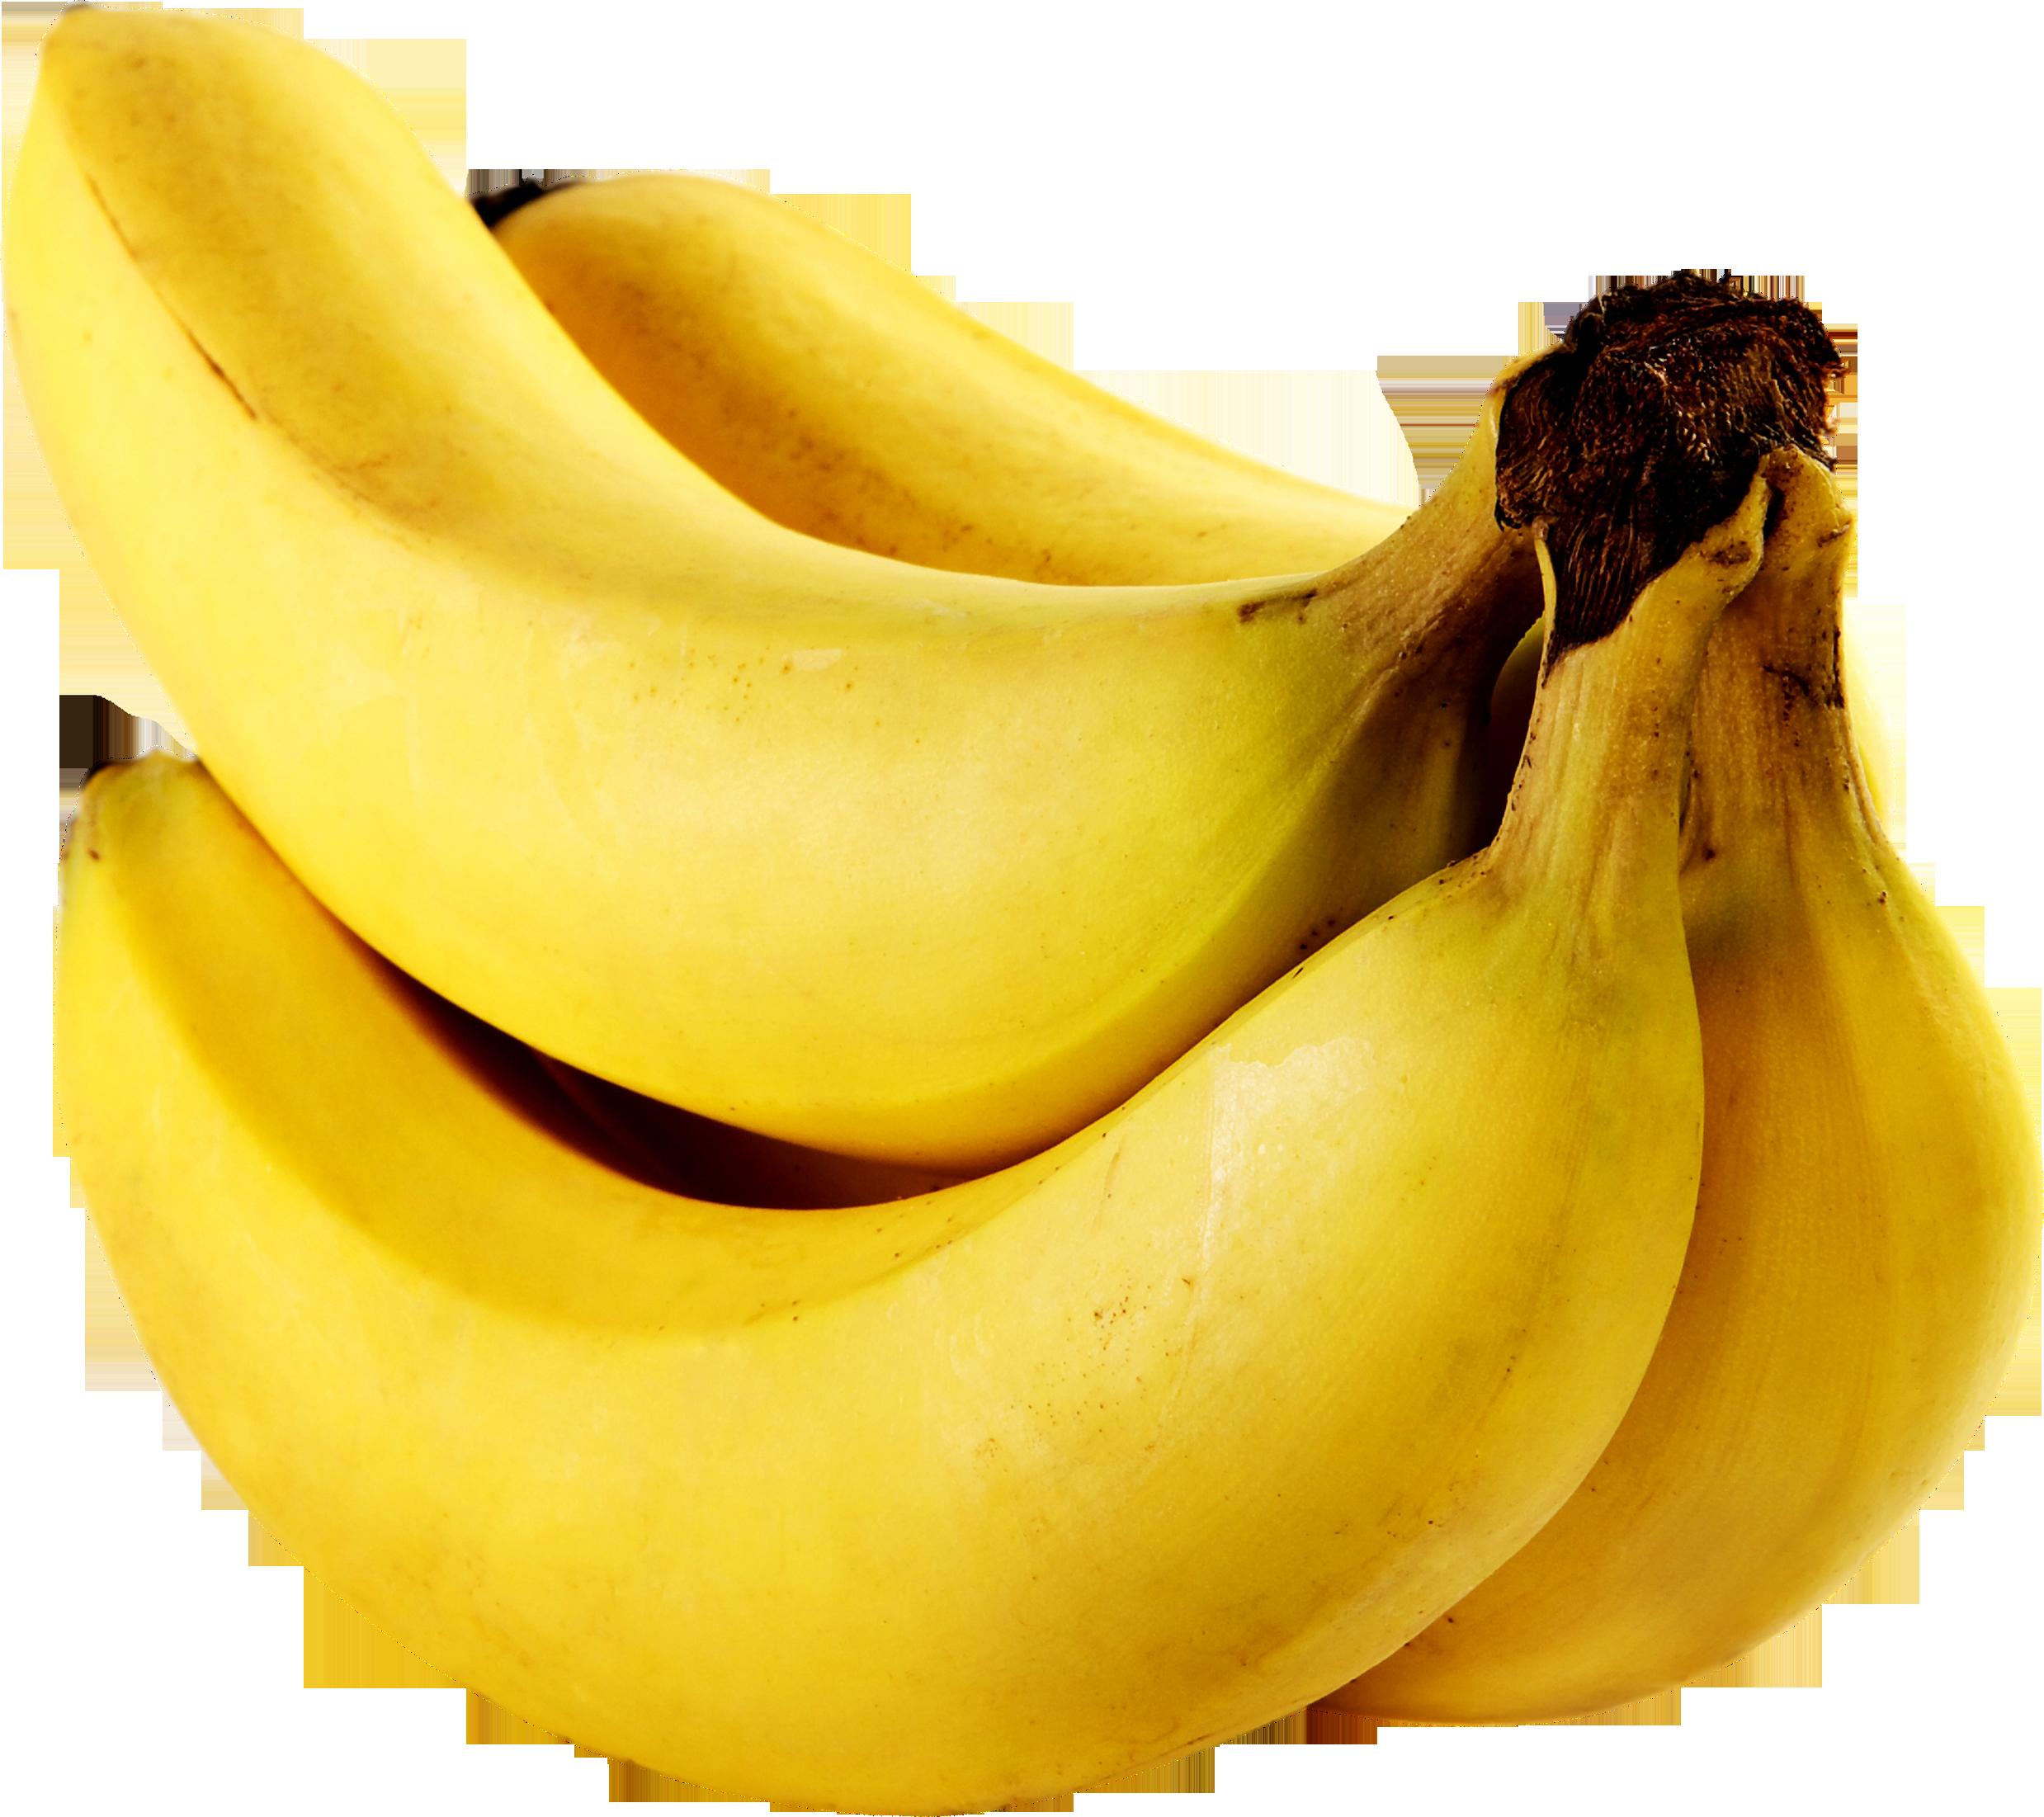 Eyes clipart banana. Hq png transparent images